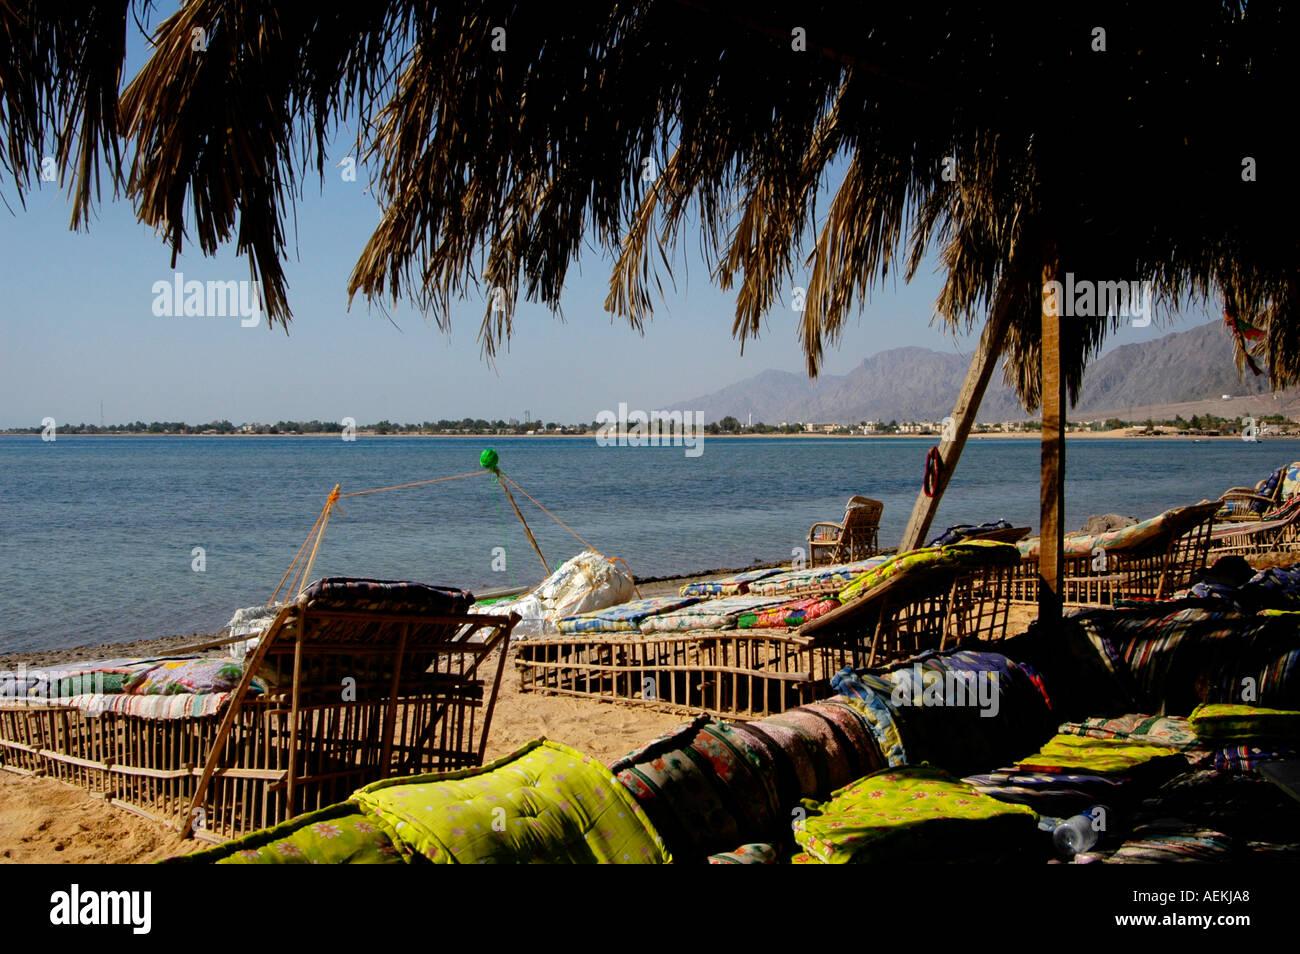 View of Nuweiba Tarabin beach in Nuweiba also spelled: Nueiba a coastal town in the eastern part of Sinai Peninsula, Egypt - Stock Image